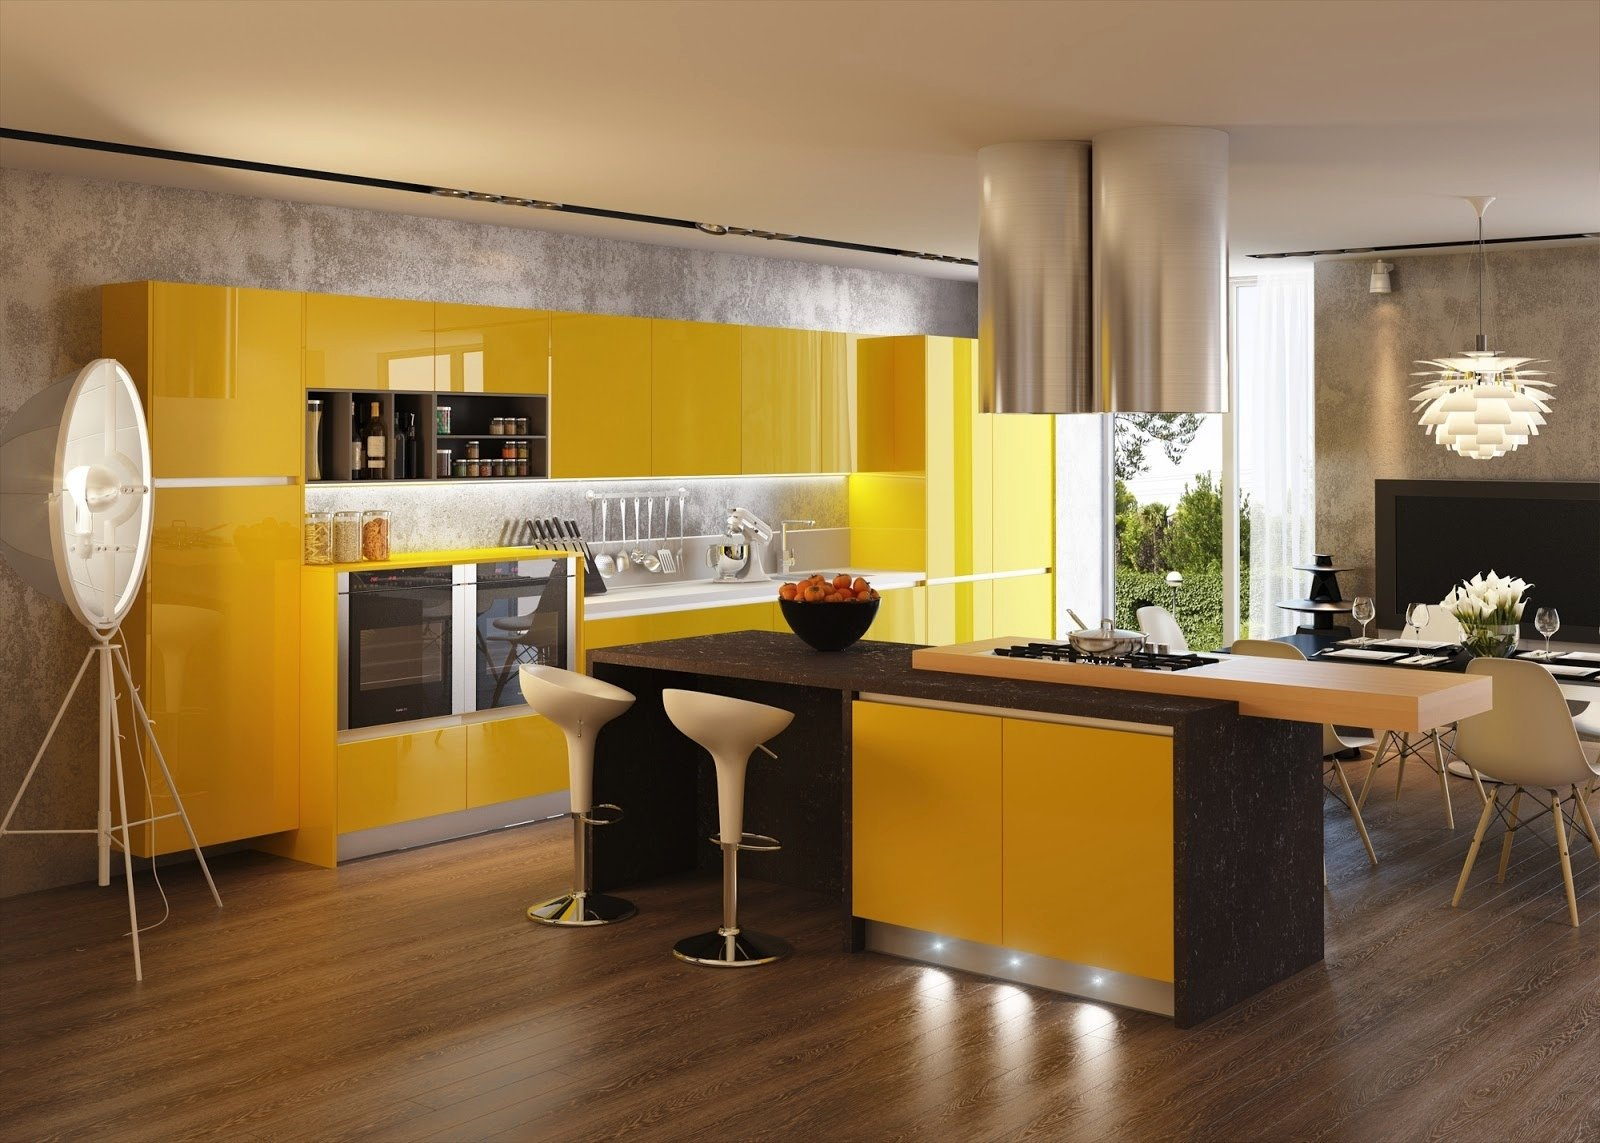 Интерьер с желтой кухней